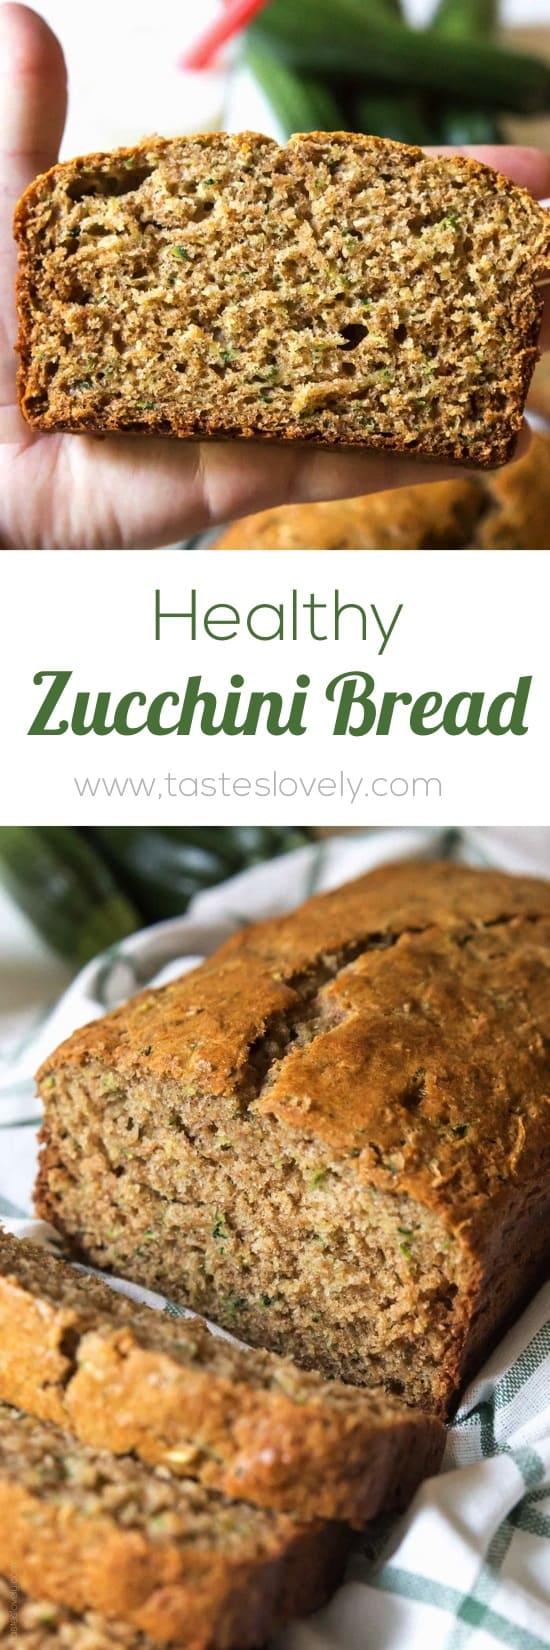 Healthy Zucchini Bread Tastes Lovely